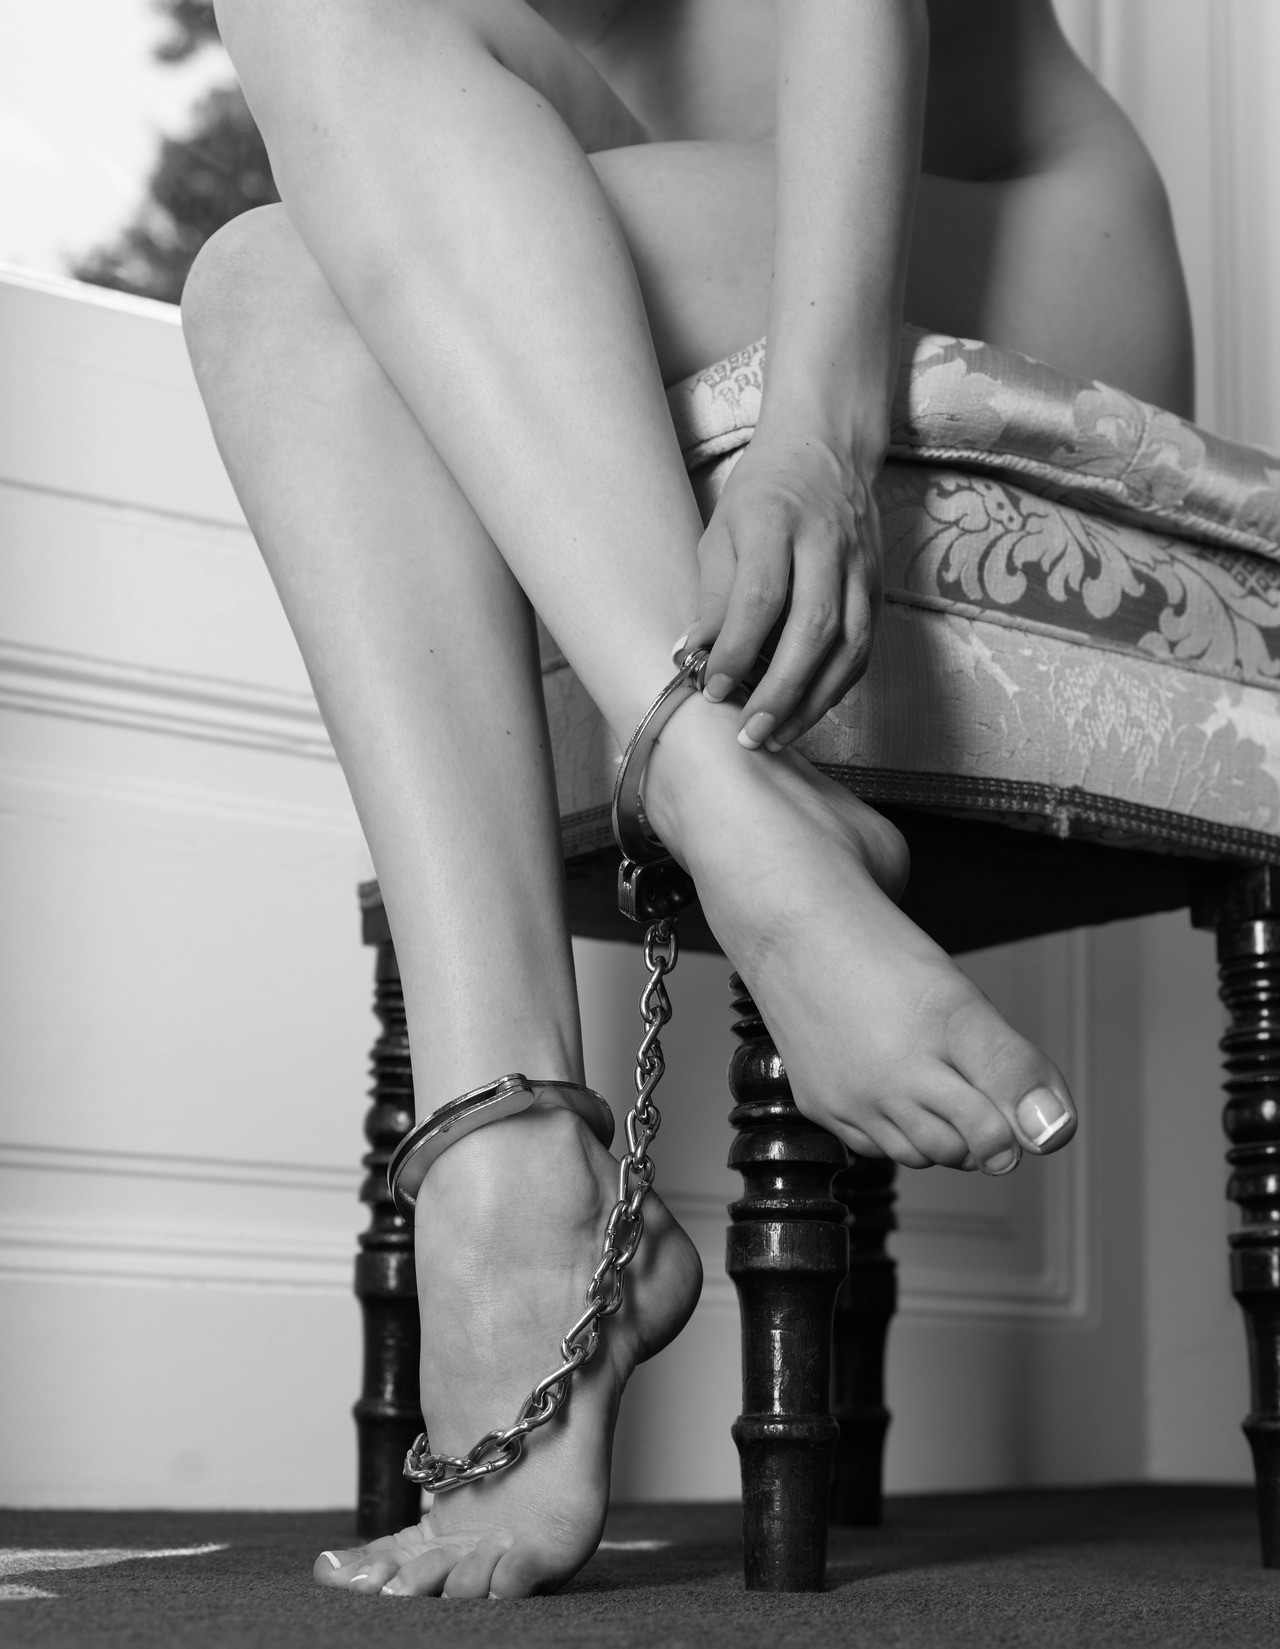 Фетиш женские ножки онлайн 9 фотография